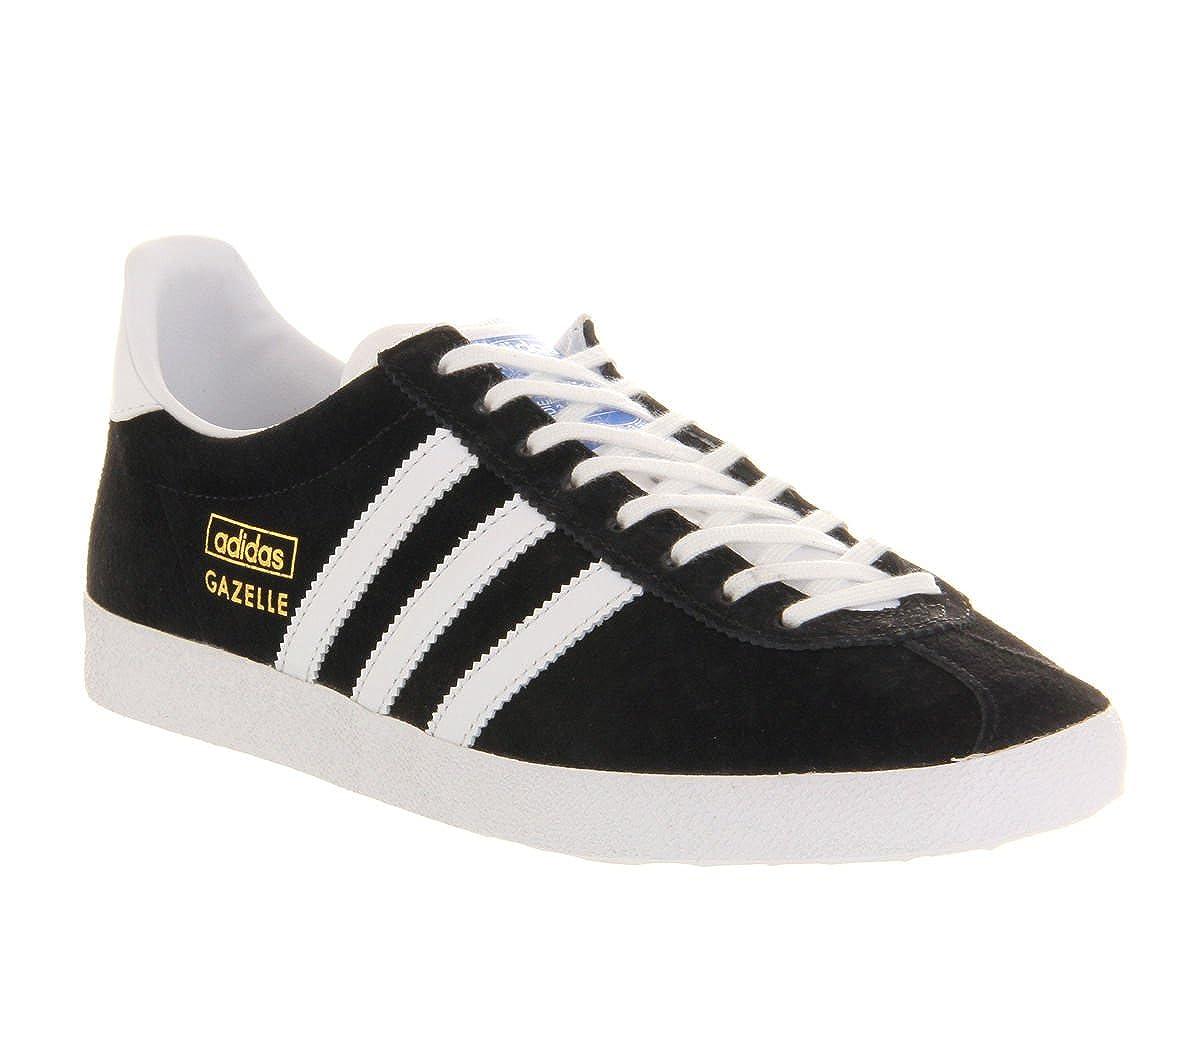 Adidas Originals Gazelle Mens Trainers Casual Shoes OG Suede Leather Black